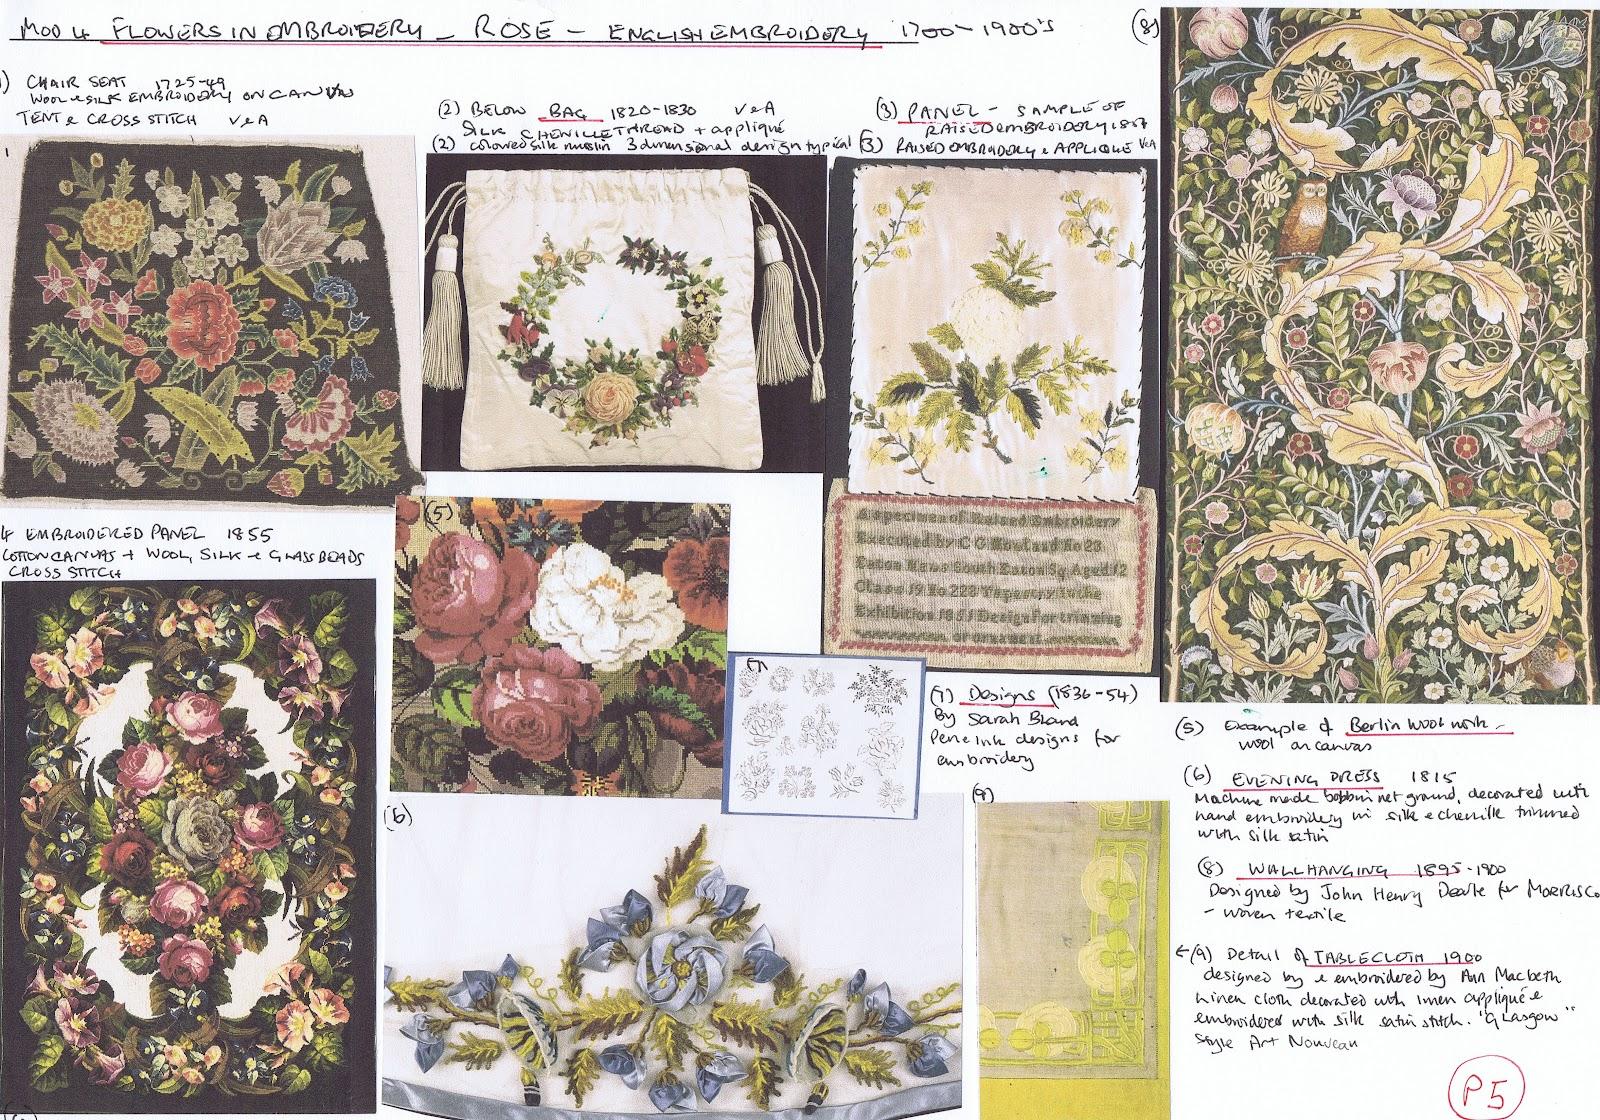 Alistitches Module 4 Forever FlowersCh 1 Historical